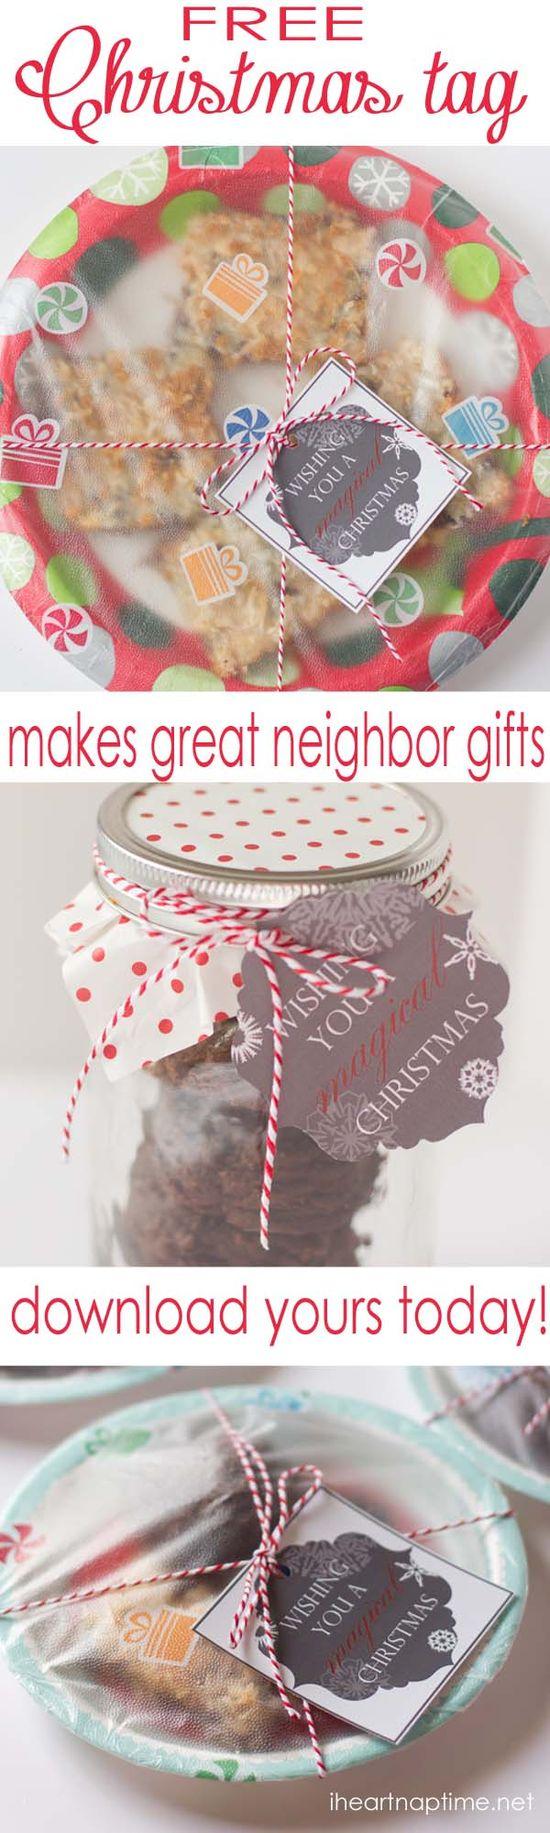 Free printable #Christmas tag on iheartnaptime.net ...great for neighbor gifts!